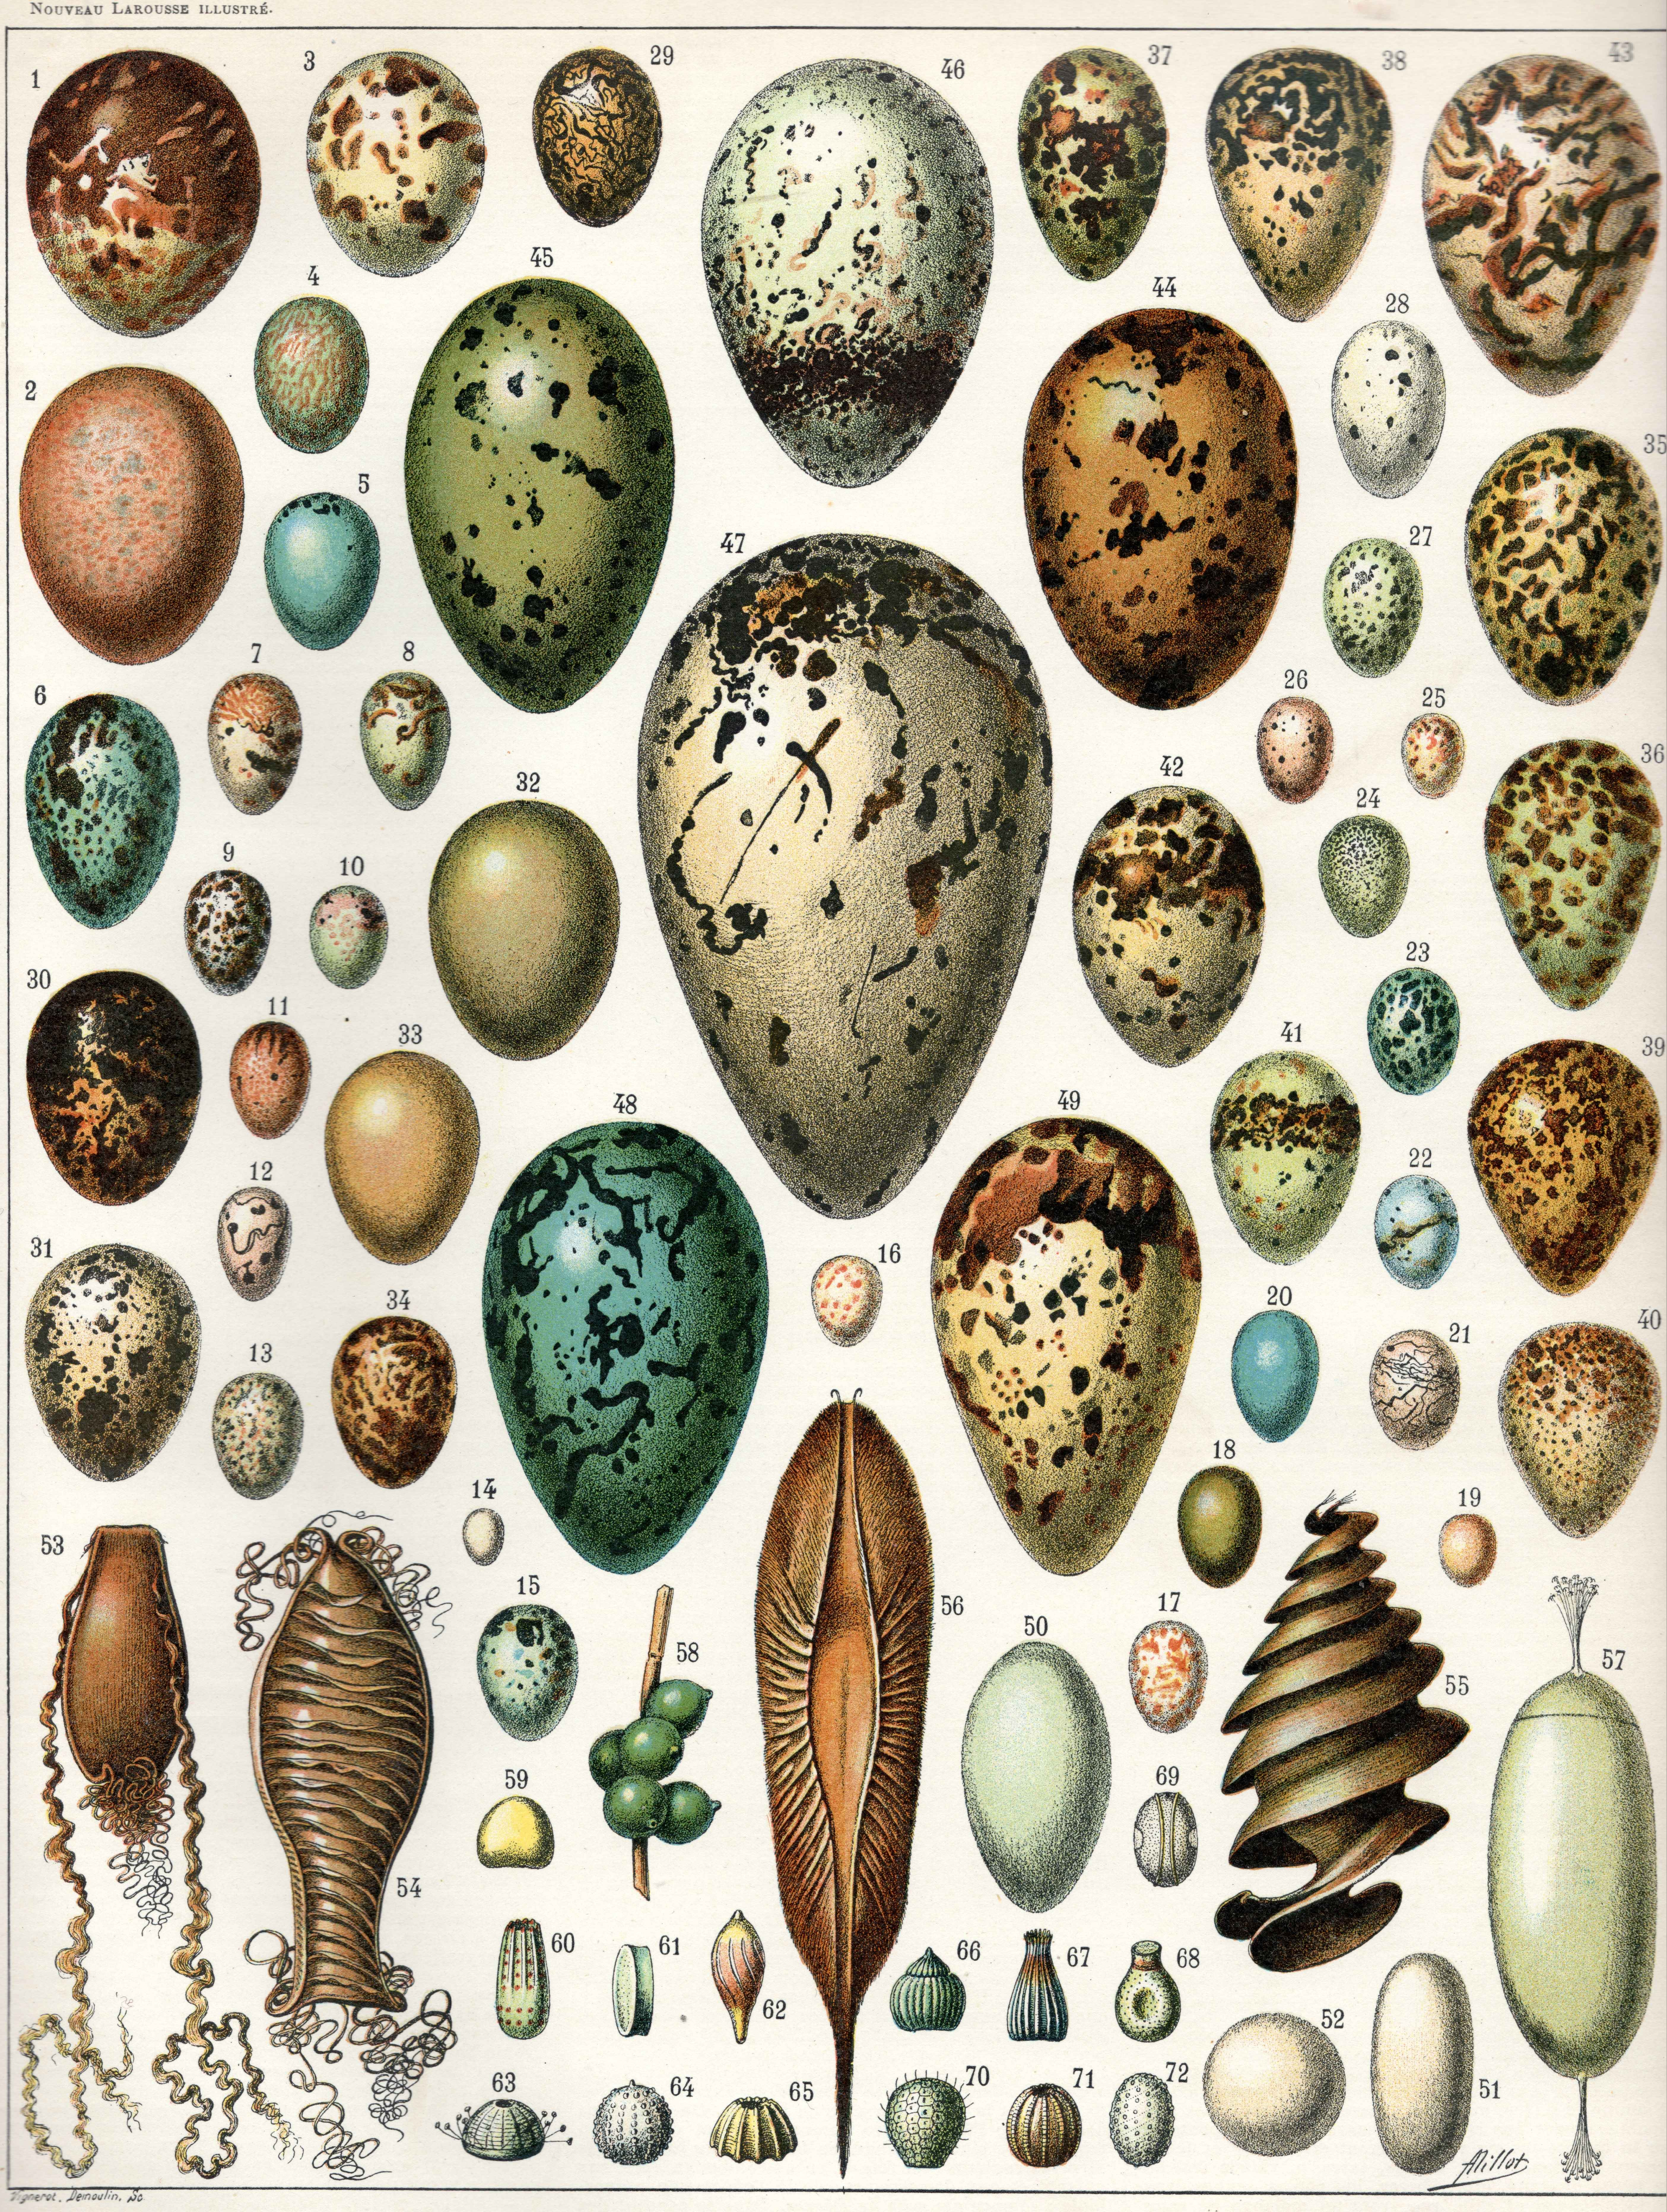 Egg Wikipedia Gallery Images And Information Snake Skeleton Diagram